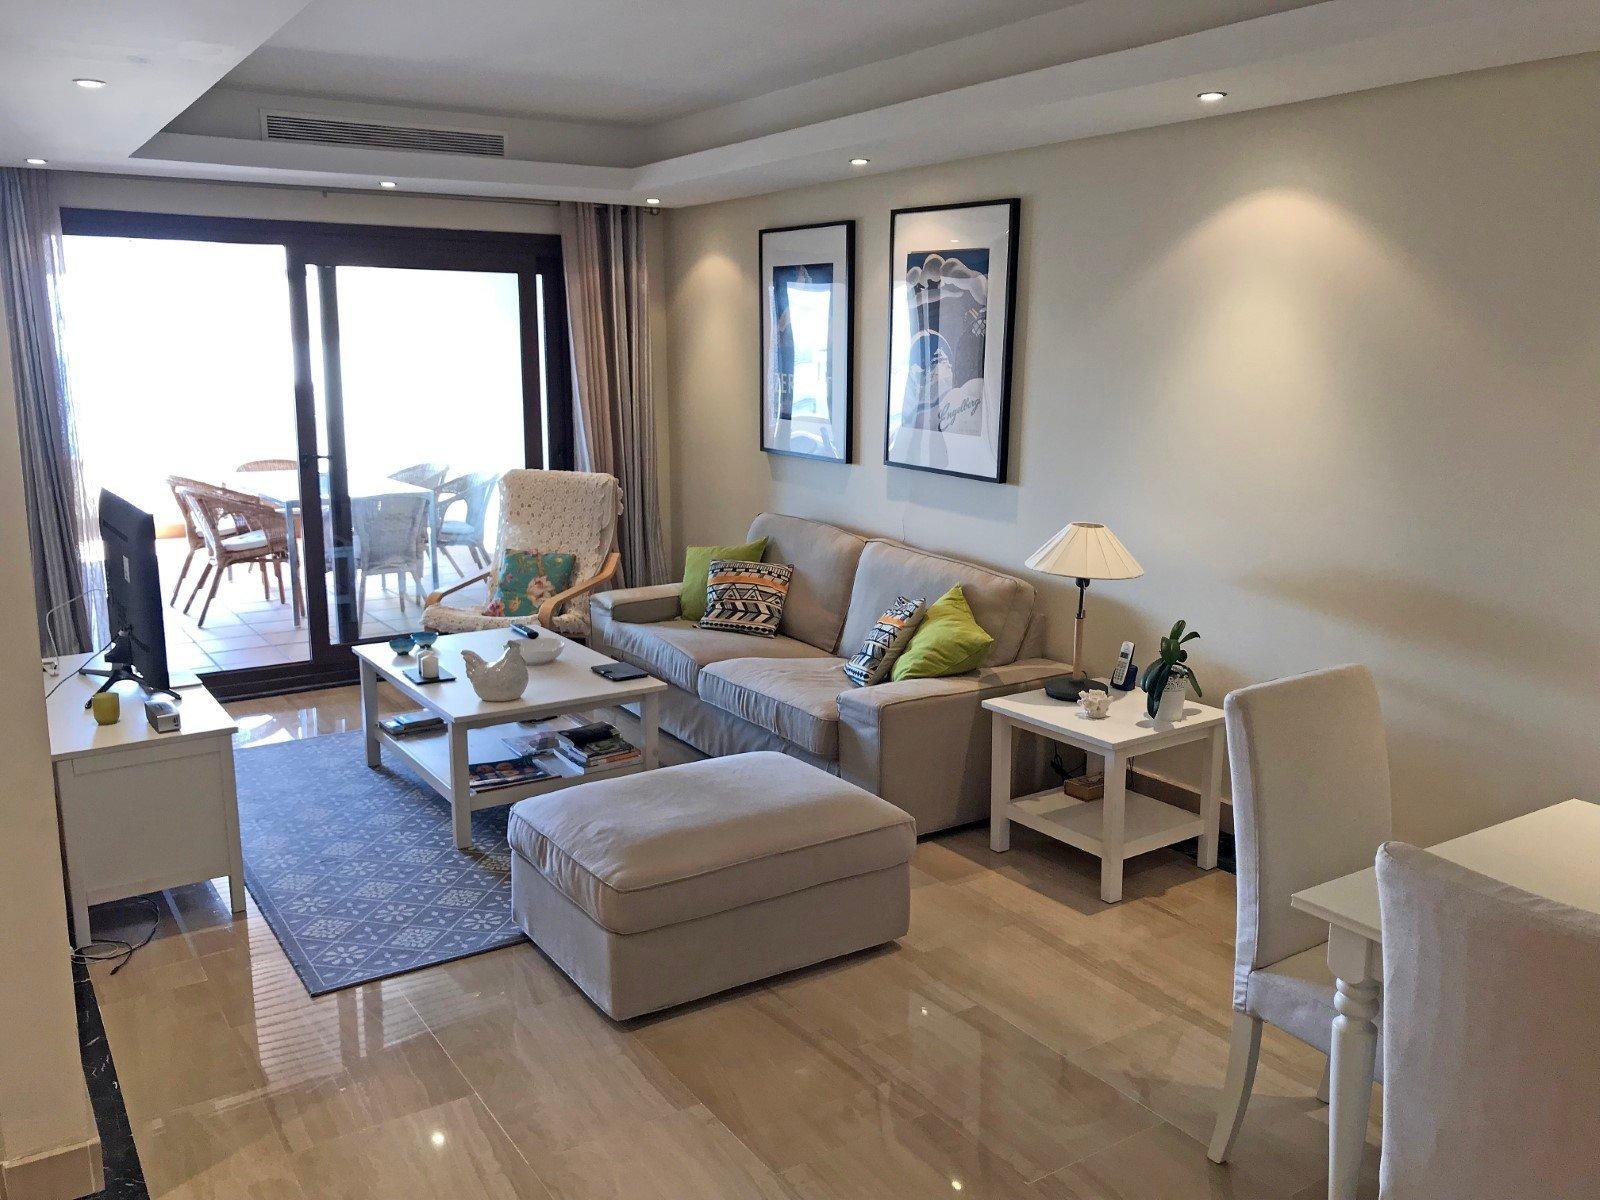 Apartment for sale in Estepona, Bahia de la Plata